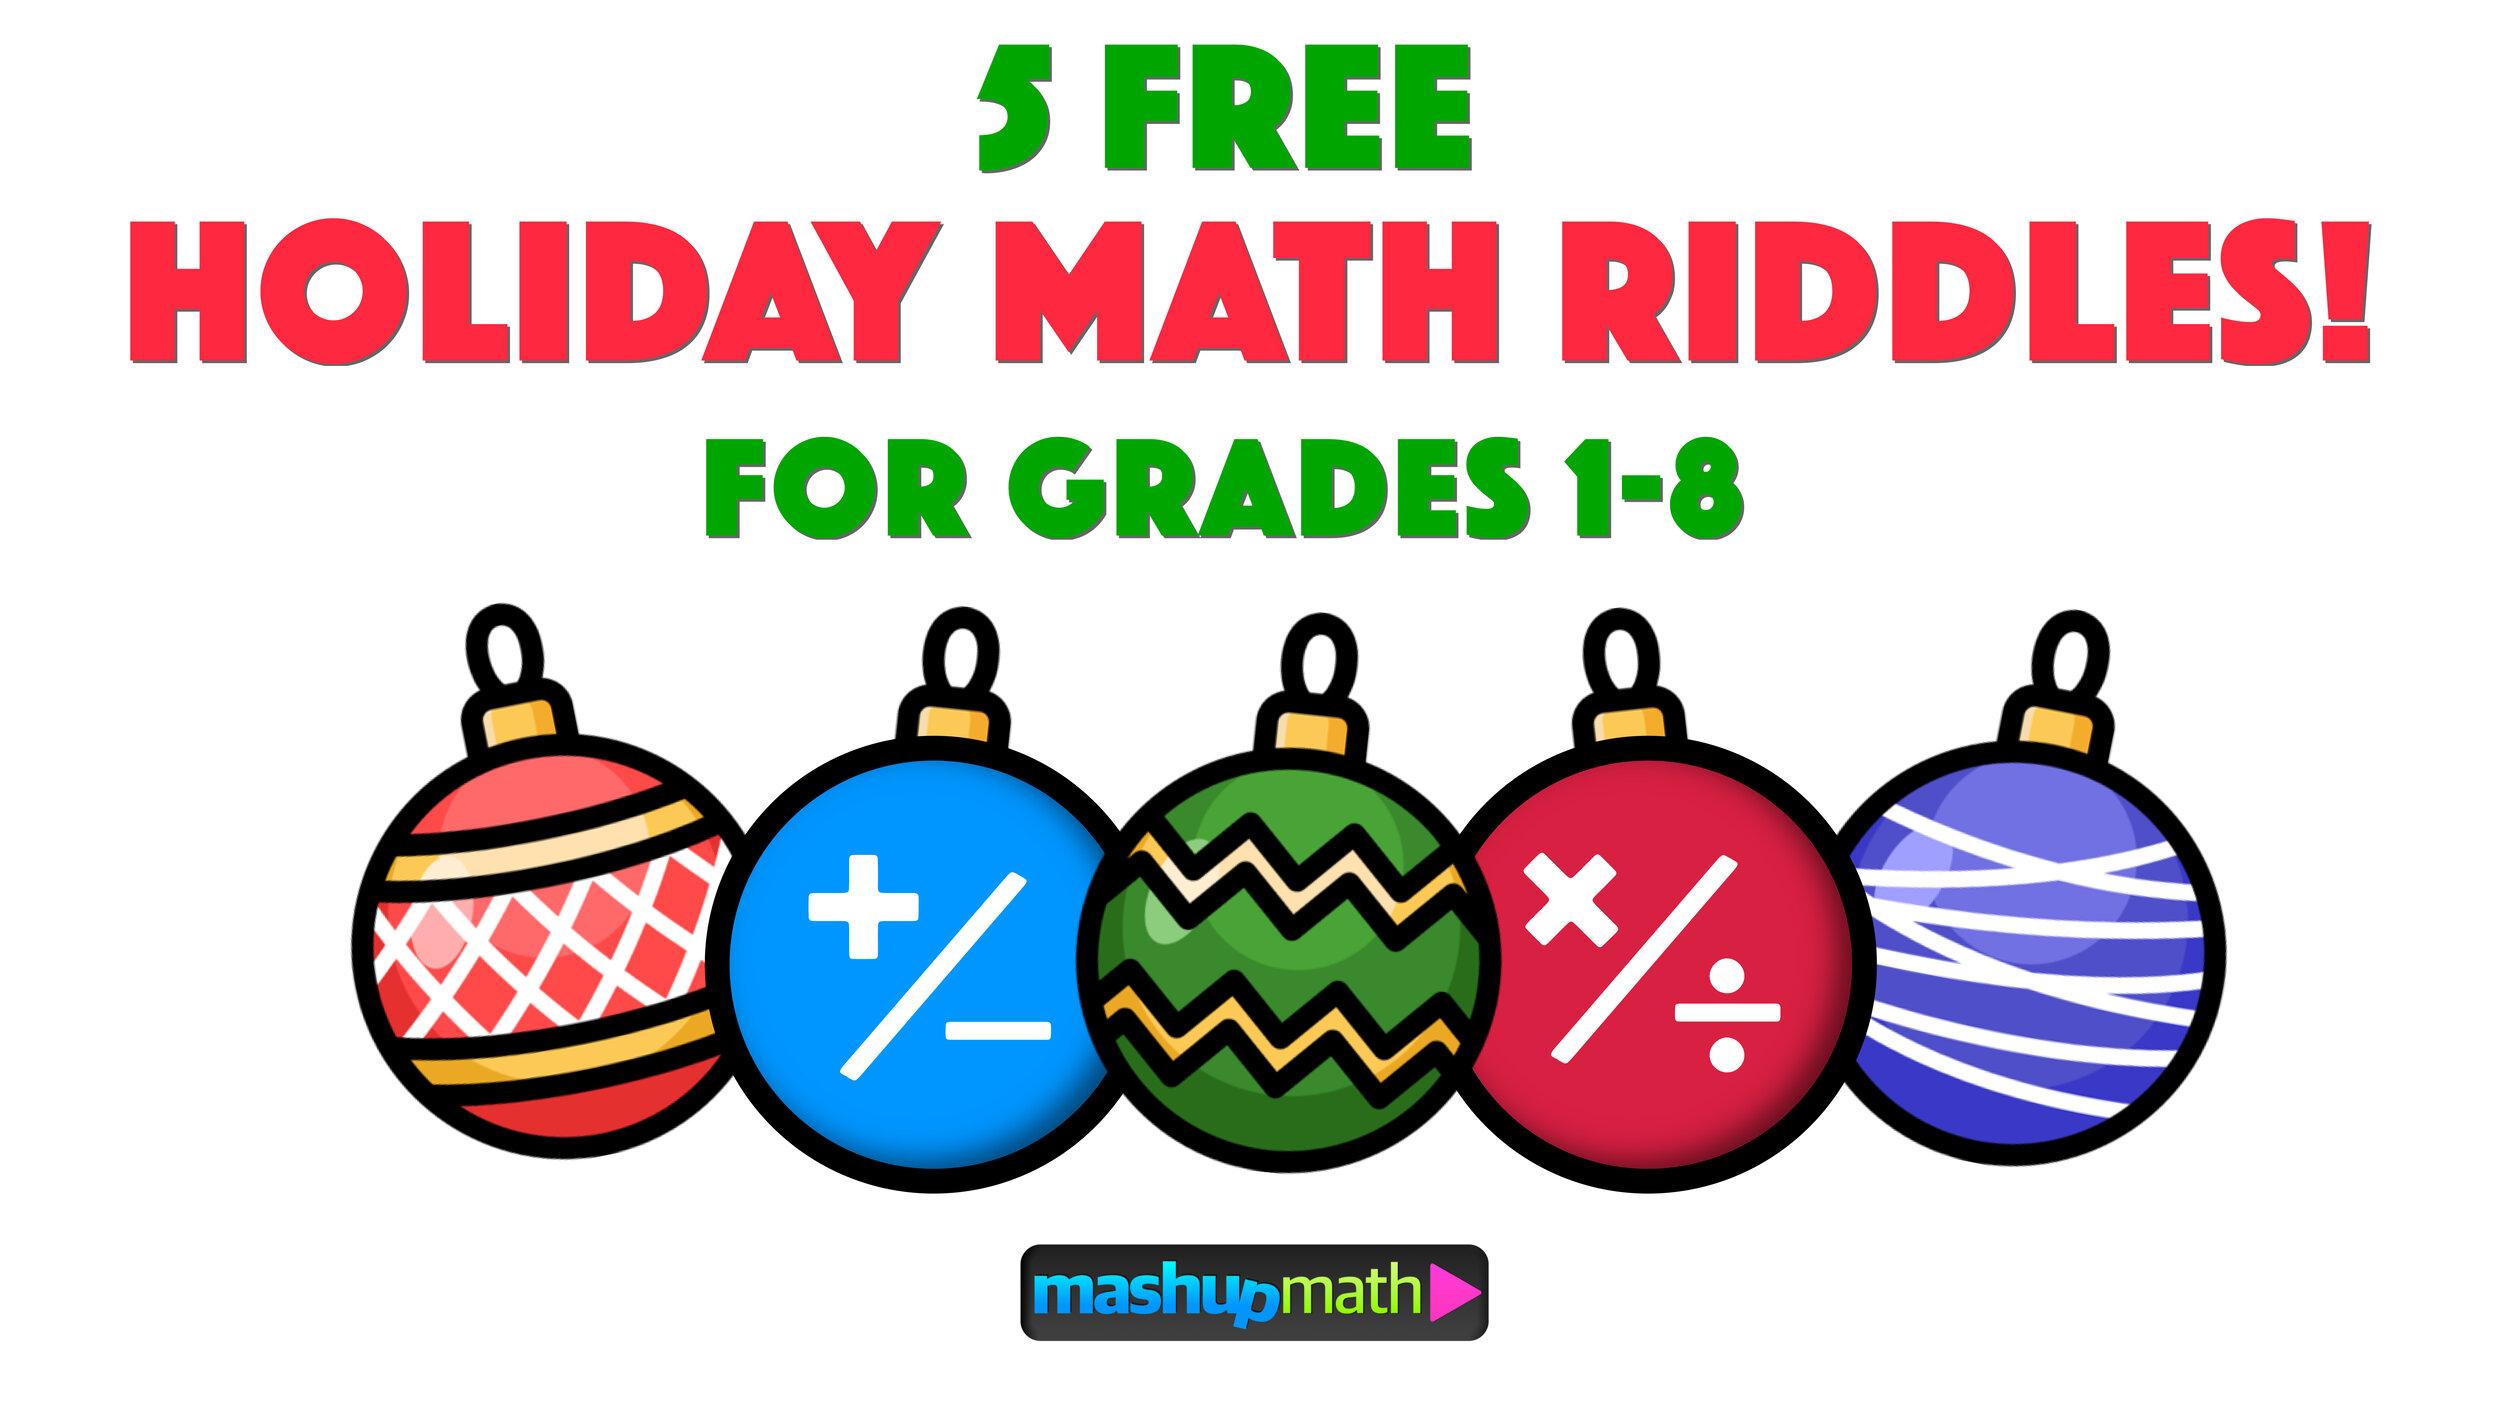 medium resolution of 5 Fun Christmas Math Riddles and Brain Teasers for Grades 1-8 — Mashup Math